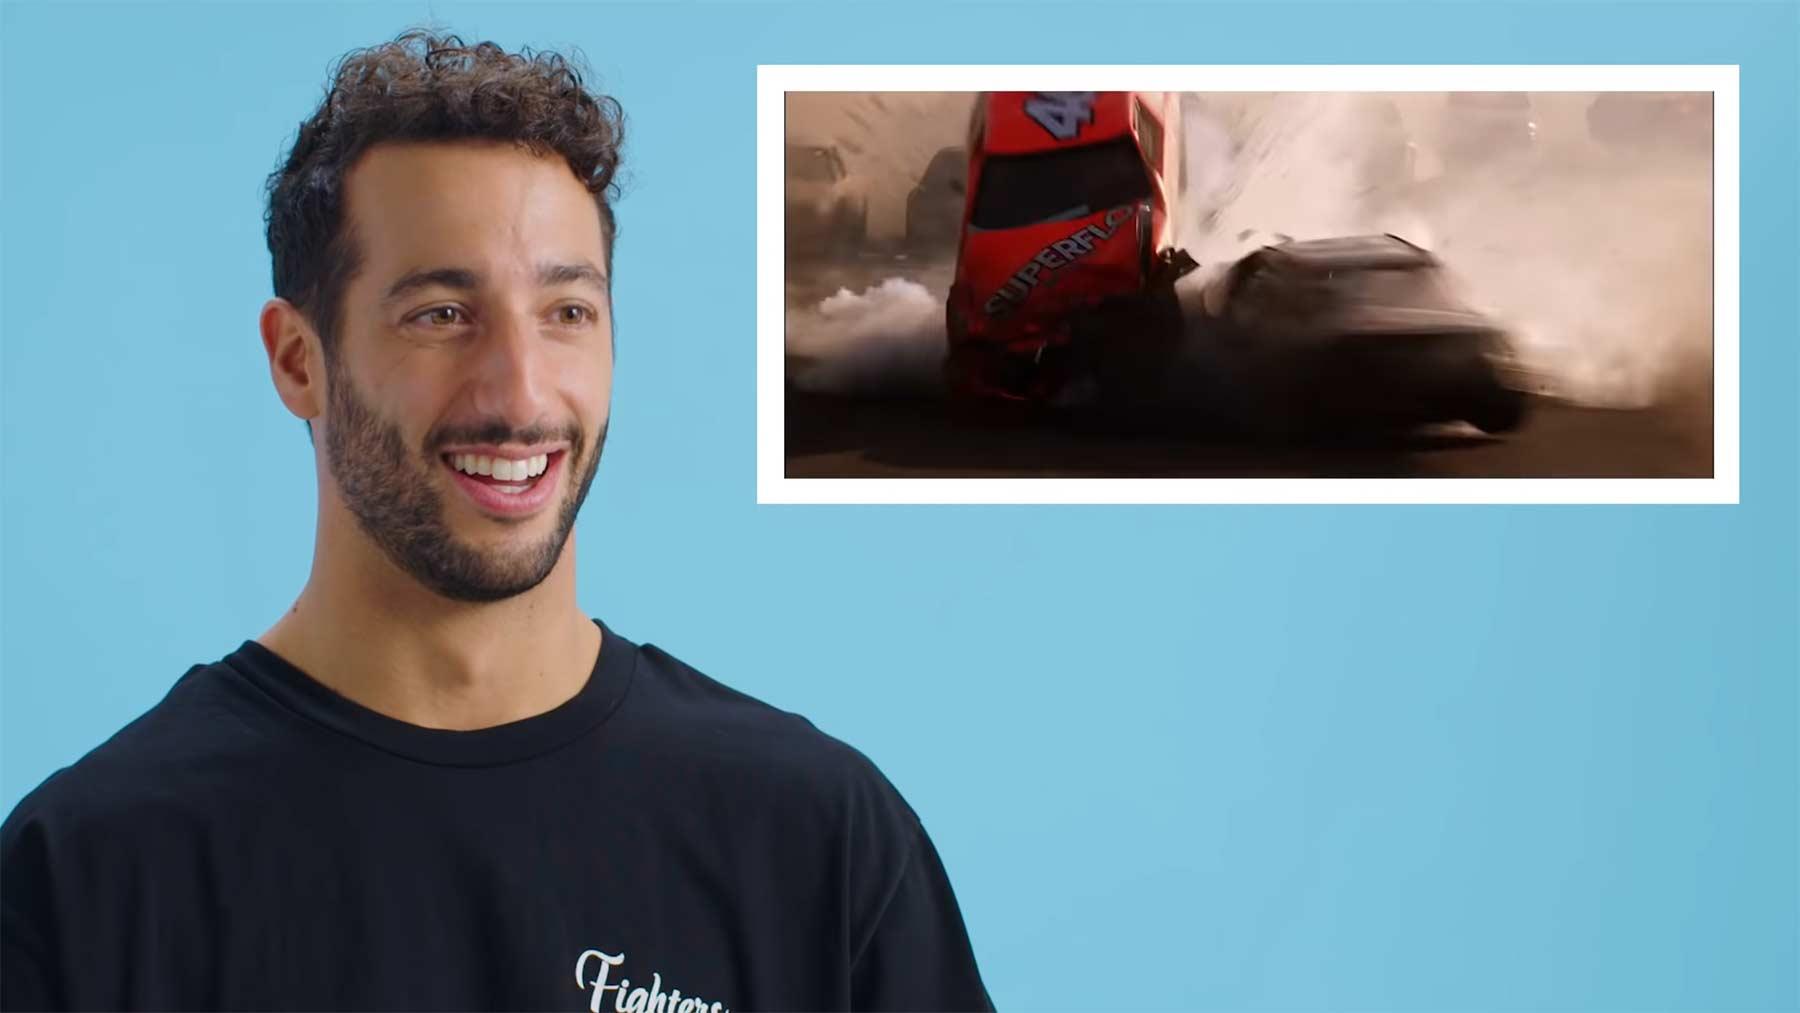 Formel-1-Rennfahrer Daniel Ricciardo bewertet Rennszenen aus Filmen